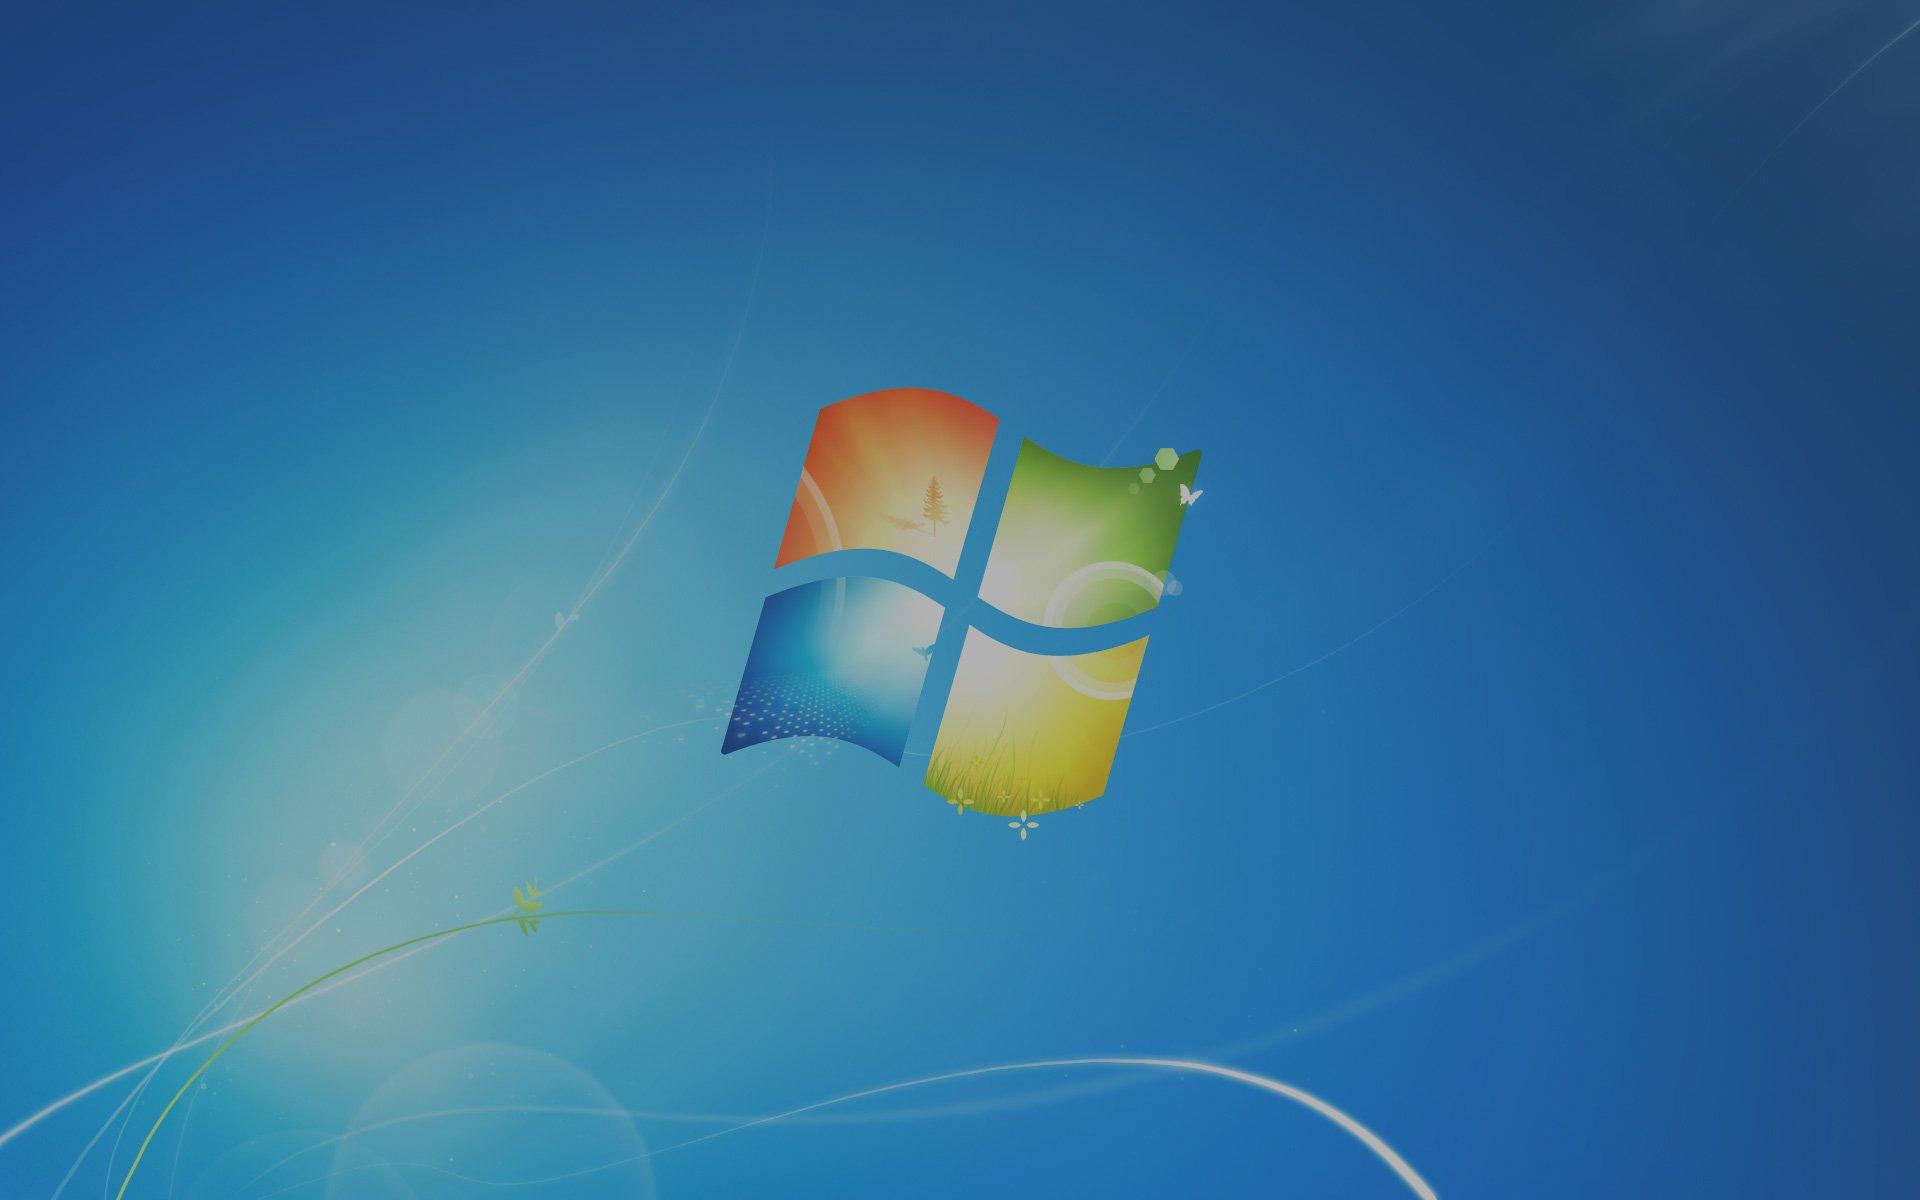 Windows-7-BG-faded-bg